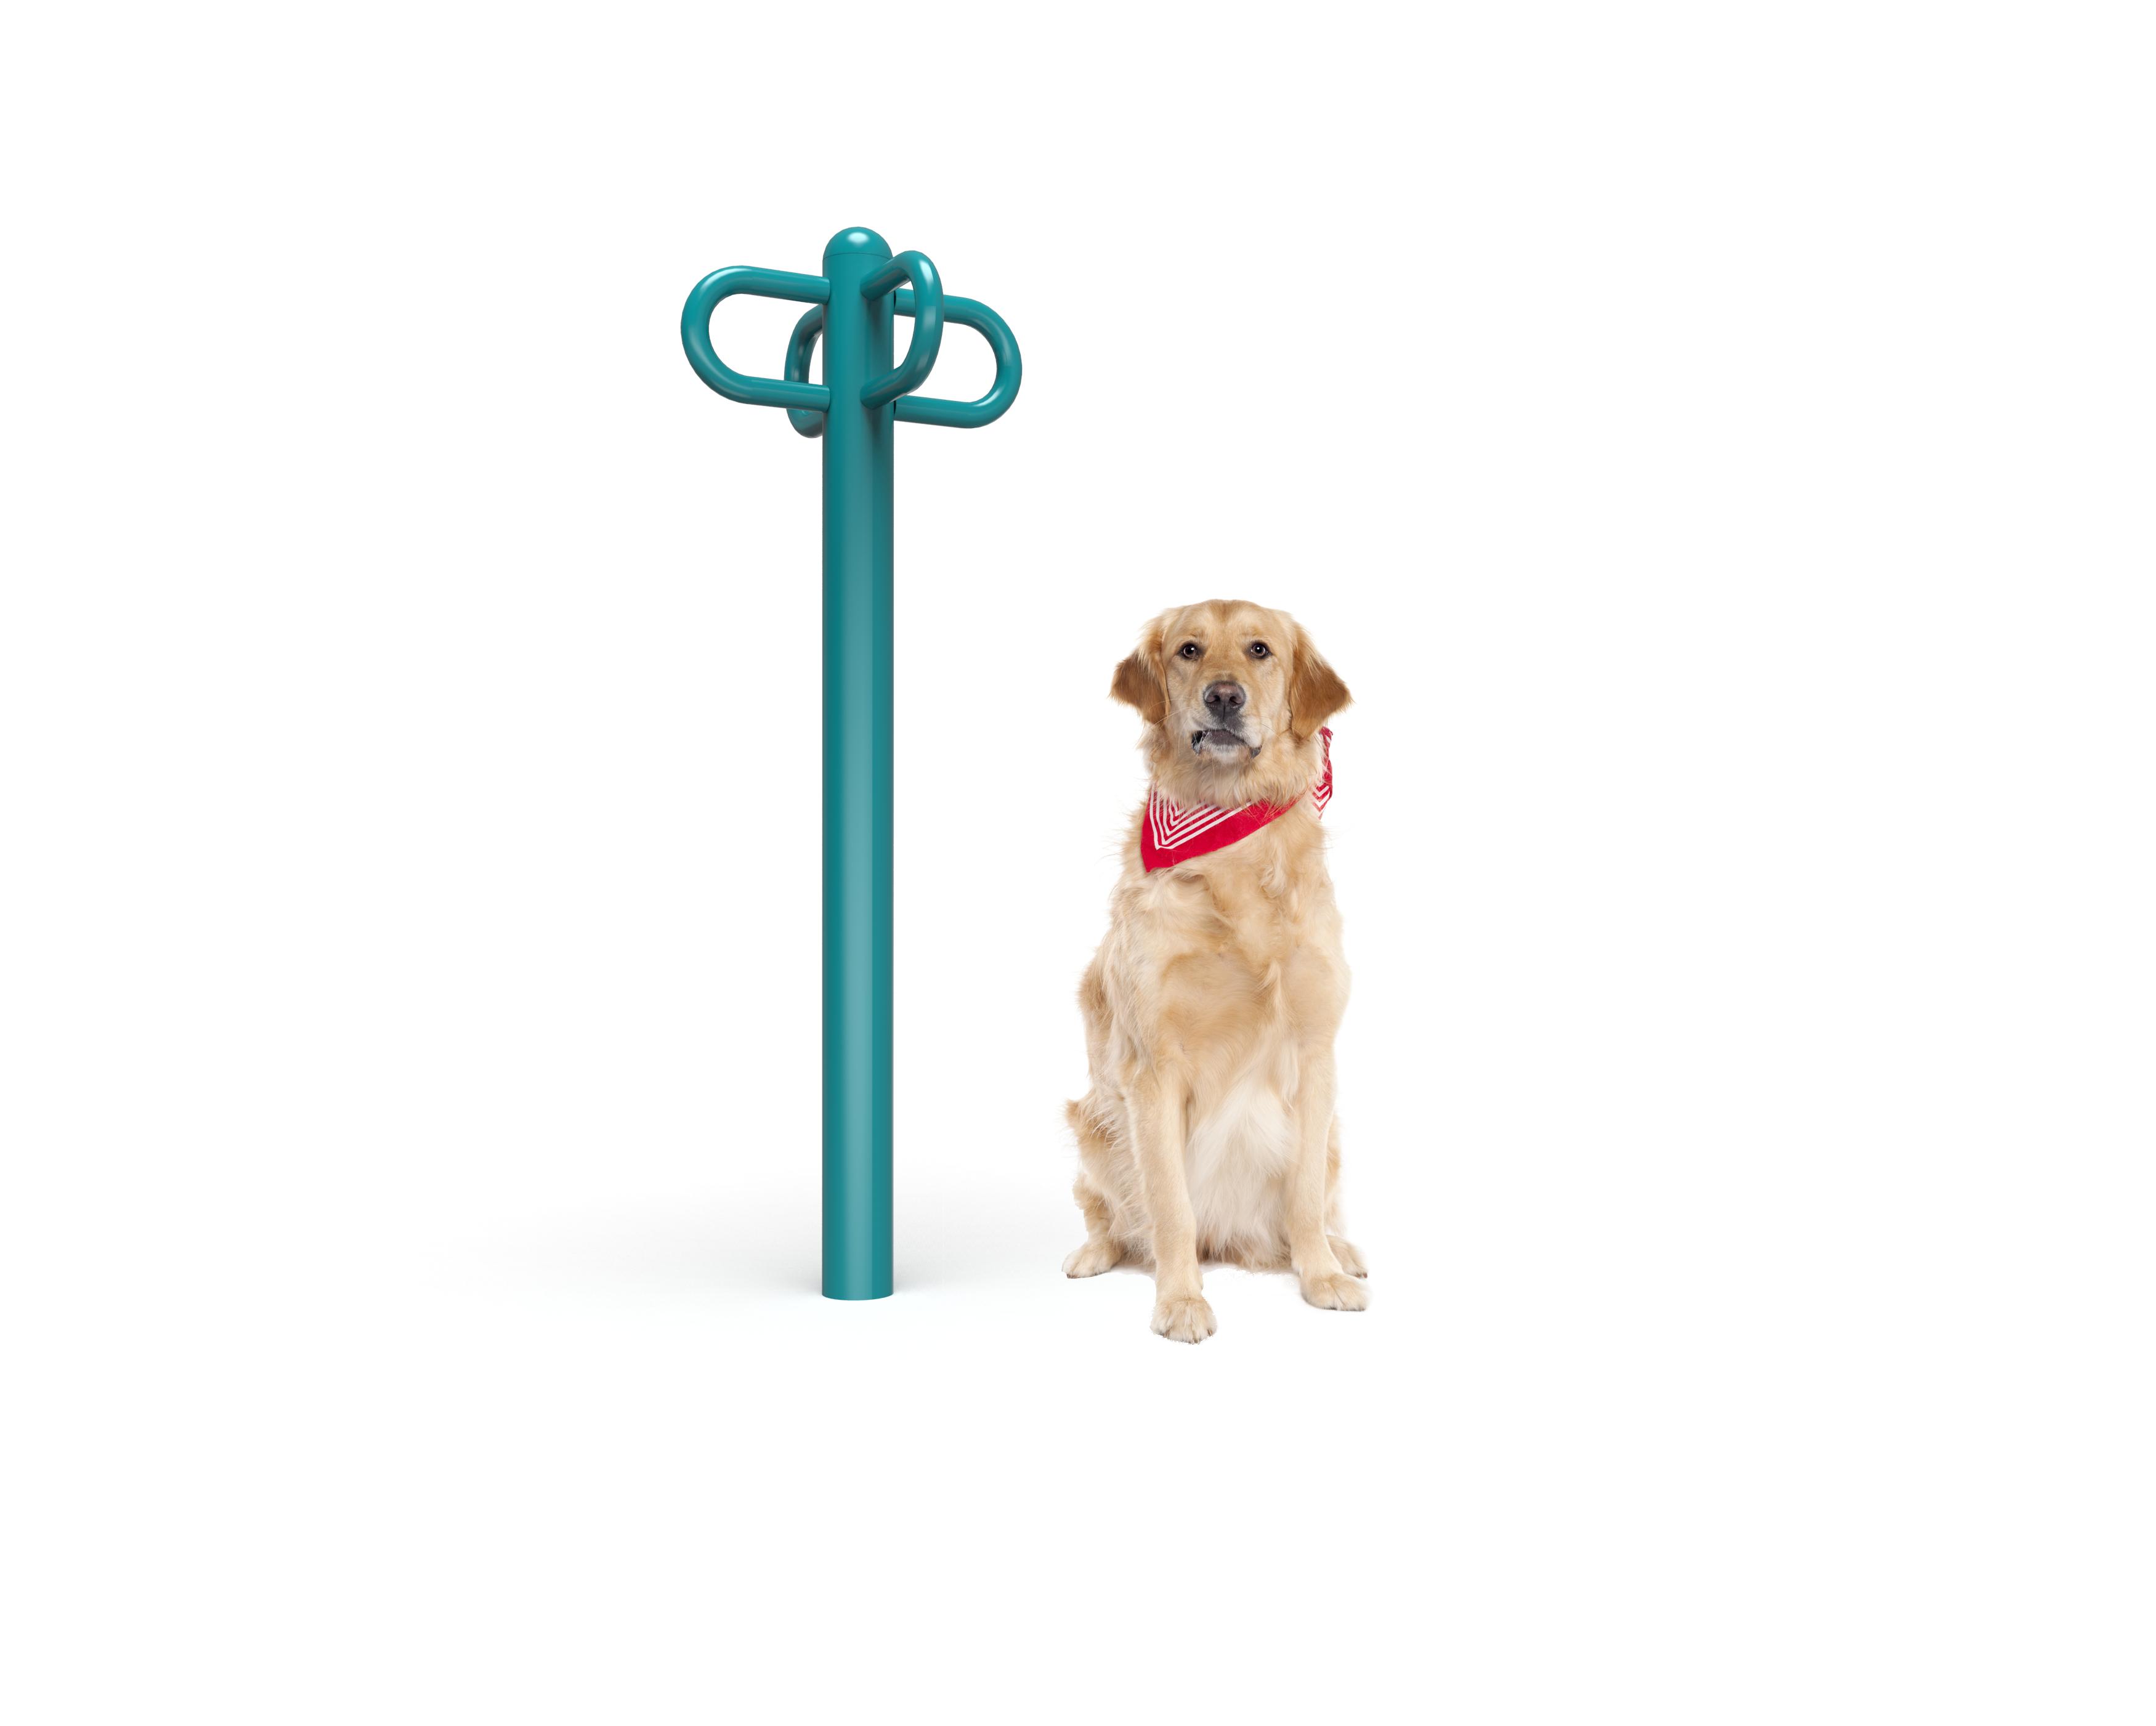 Dog Leash Rack (MRDP12)